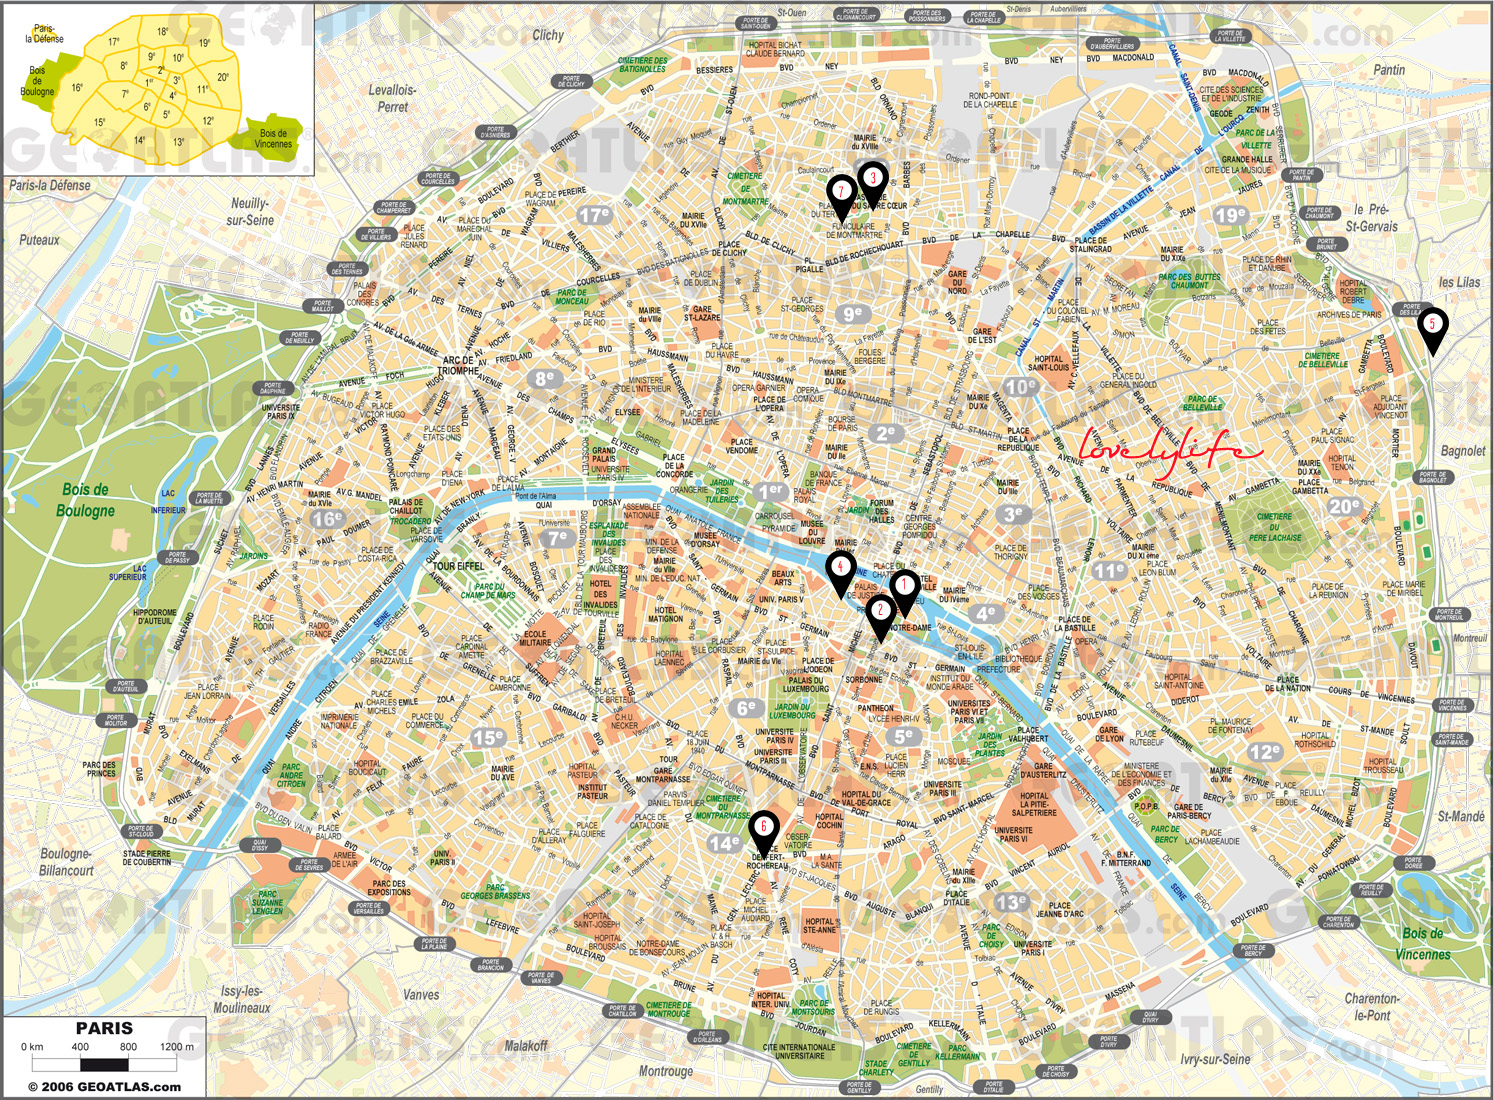 Sitios curiosos y gratis para ver en par s lovely life for Parigi non turistica